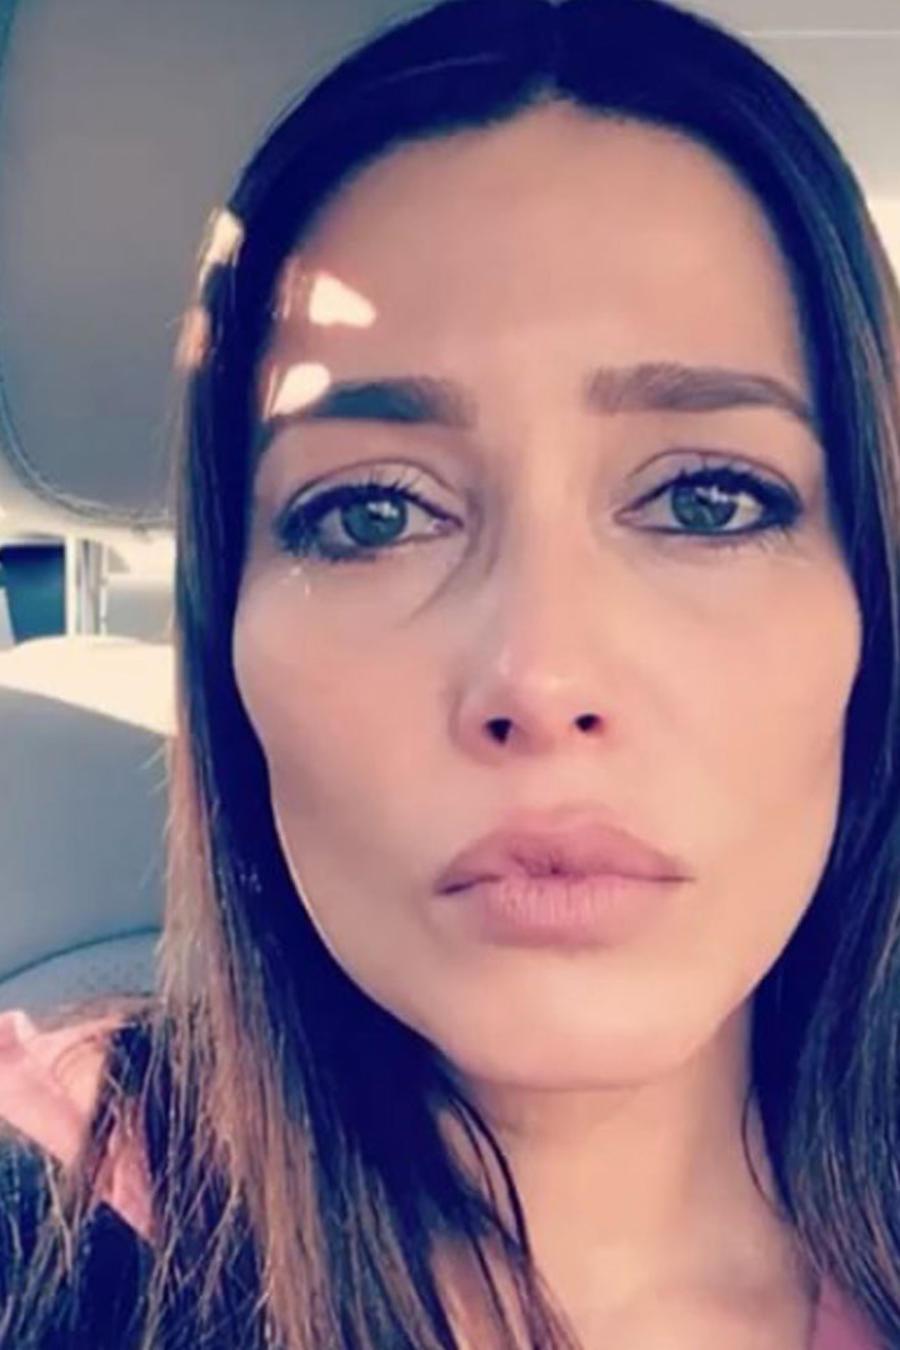 adriana fonseca denuncia racismo